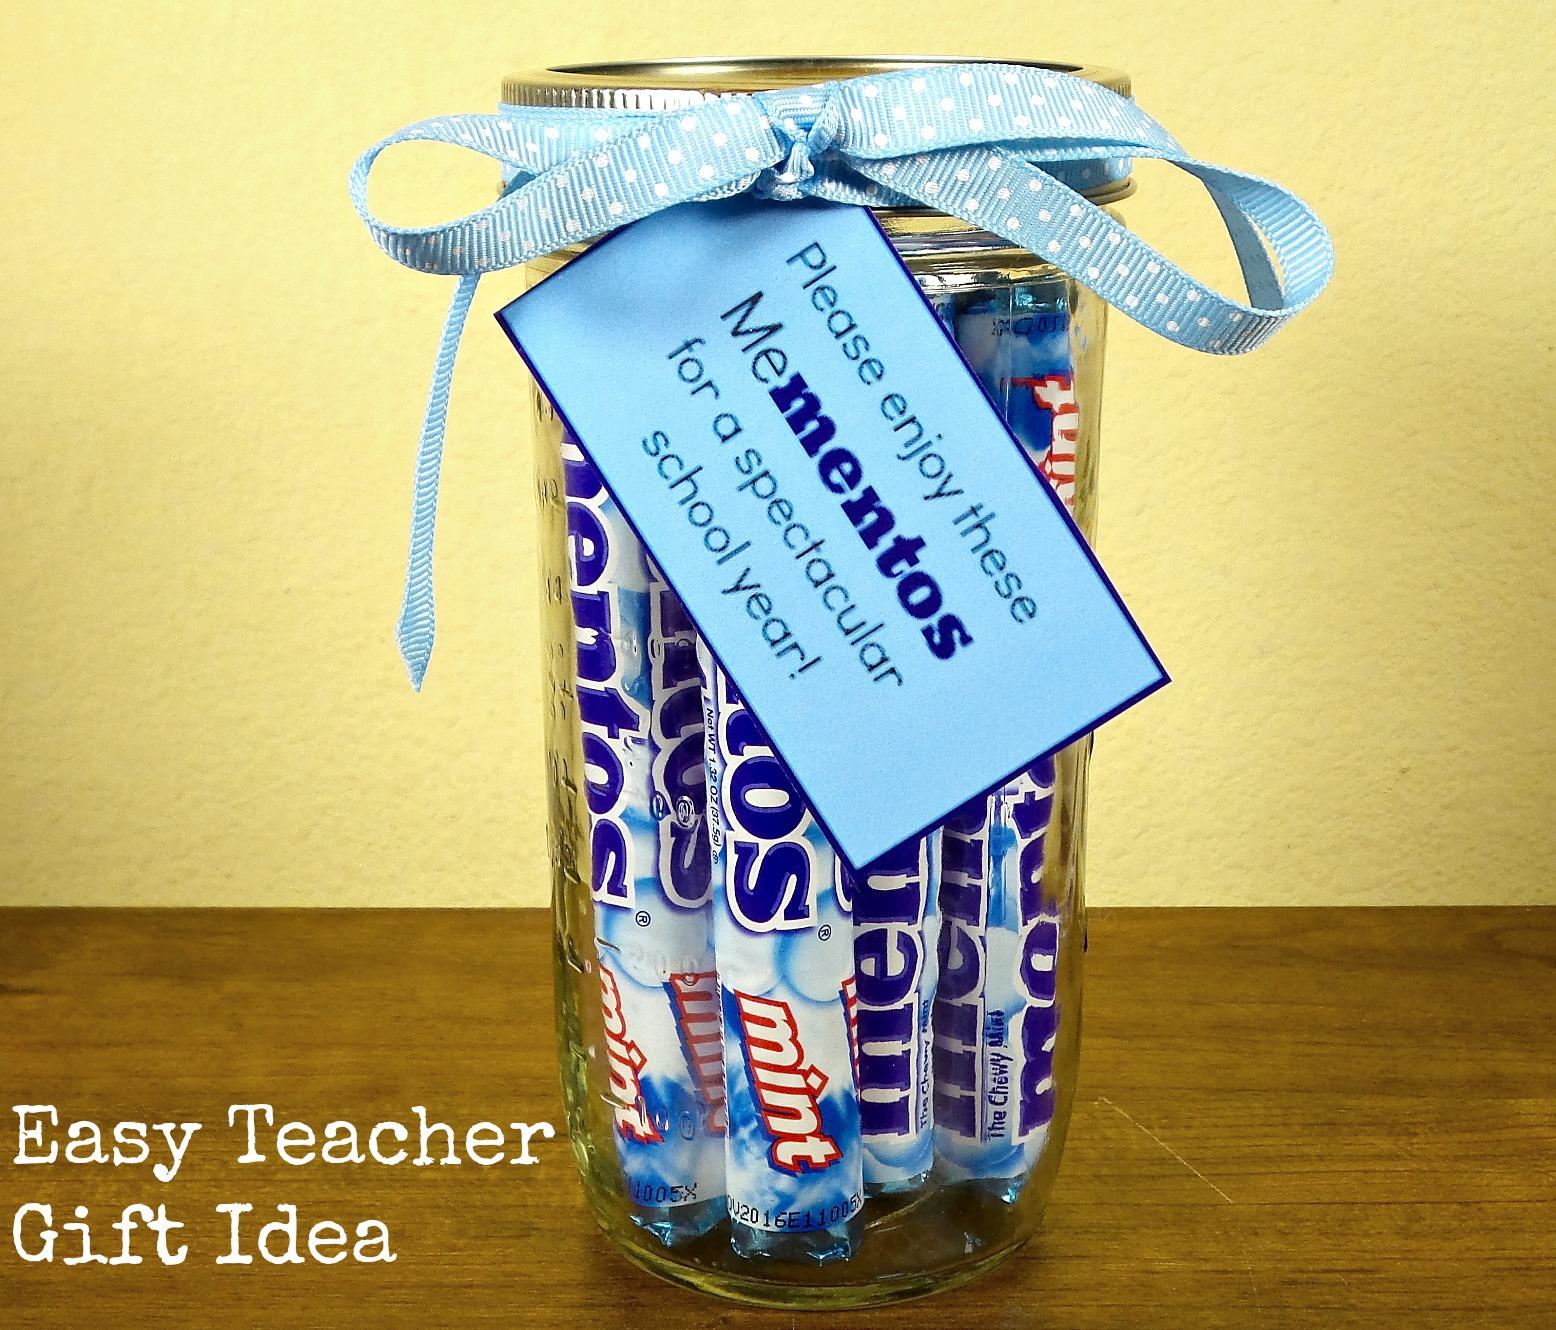 Easy Teacher Gift Idea Family Fun Journal